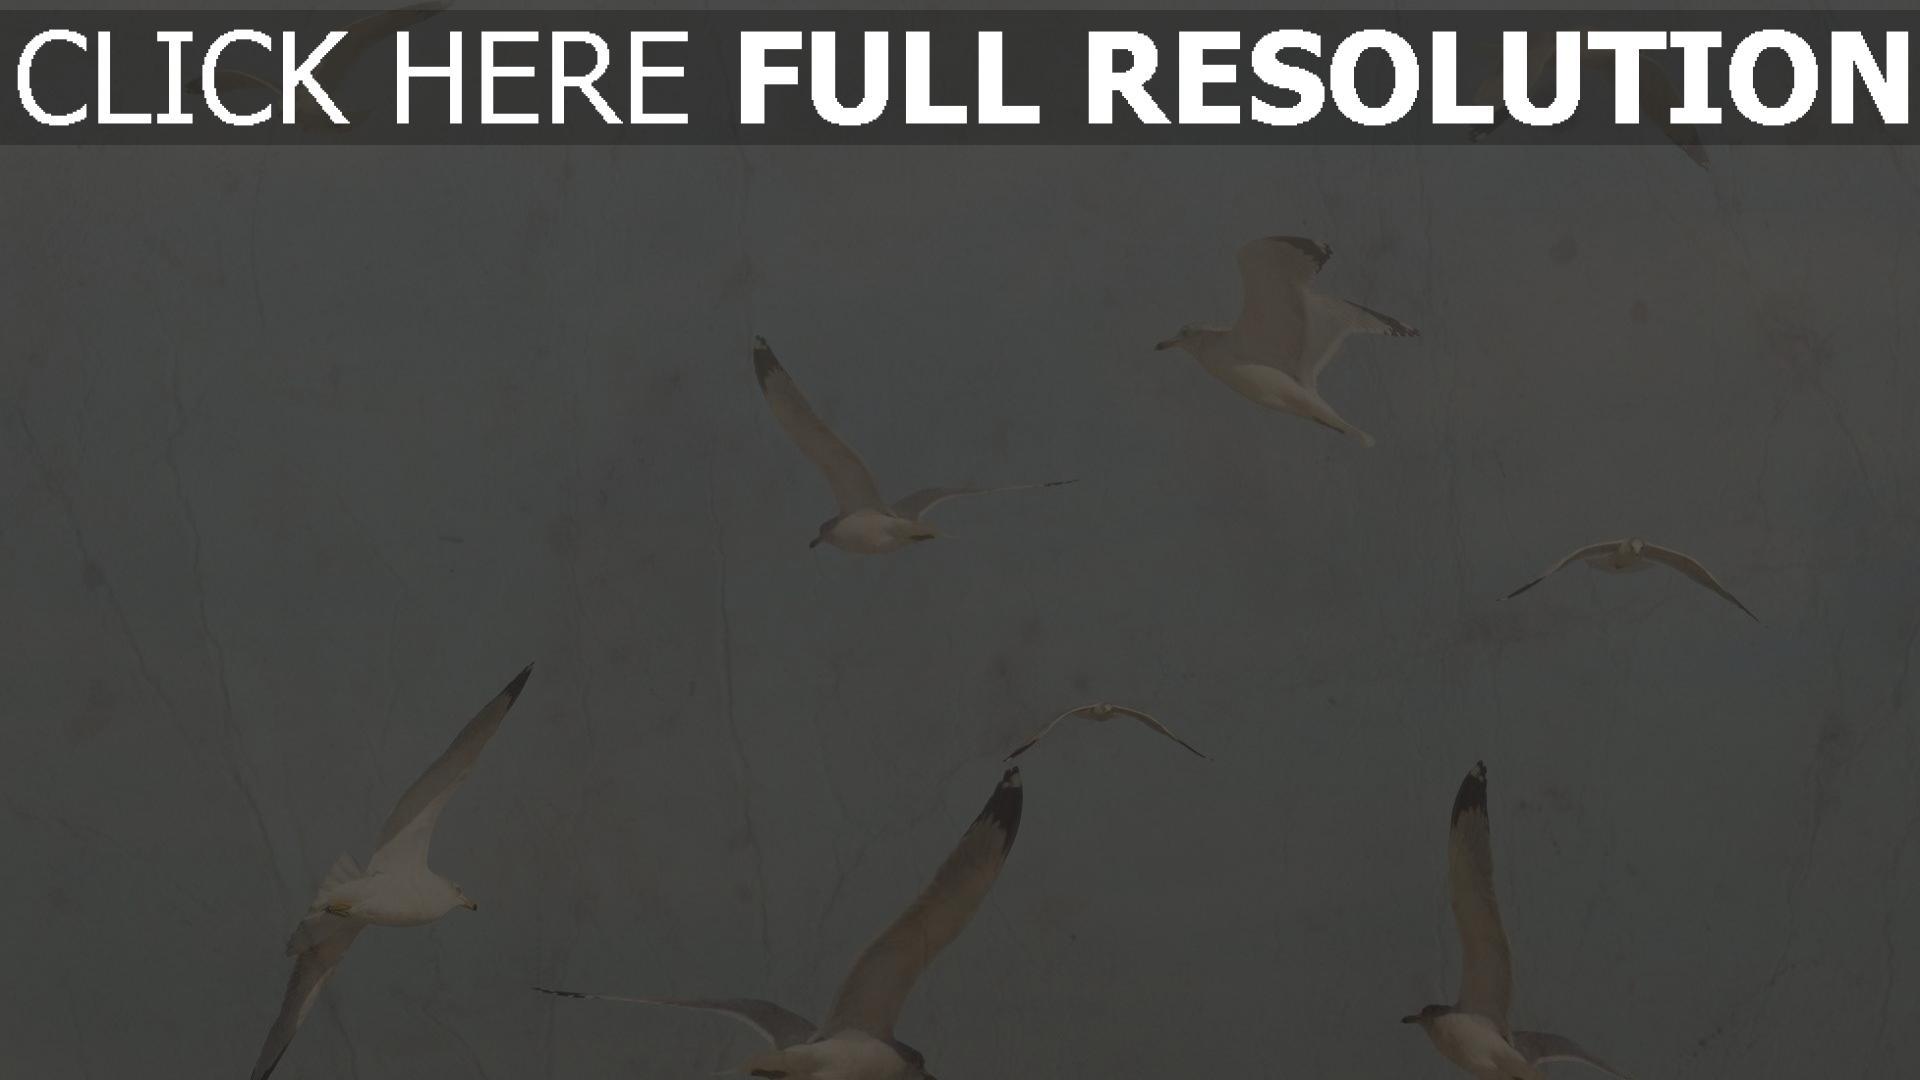 hd hintergrundbilder vögel möwen flug retro-foto 1920x1080